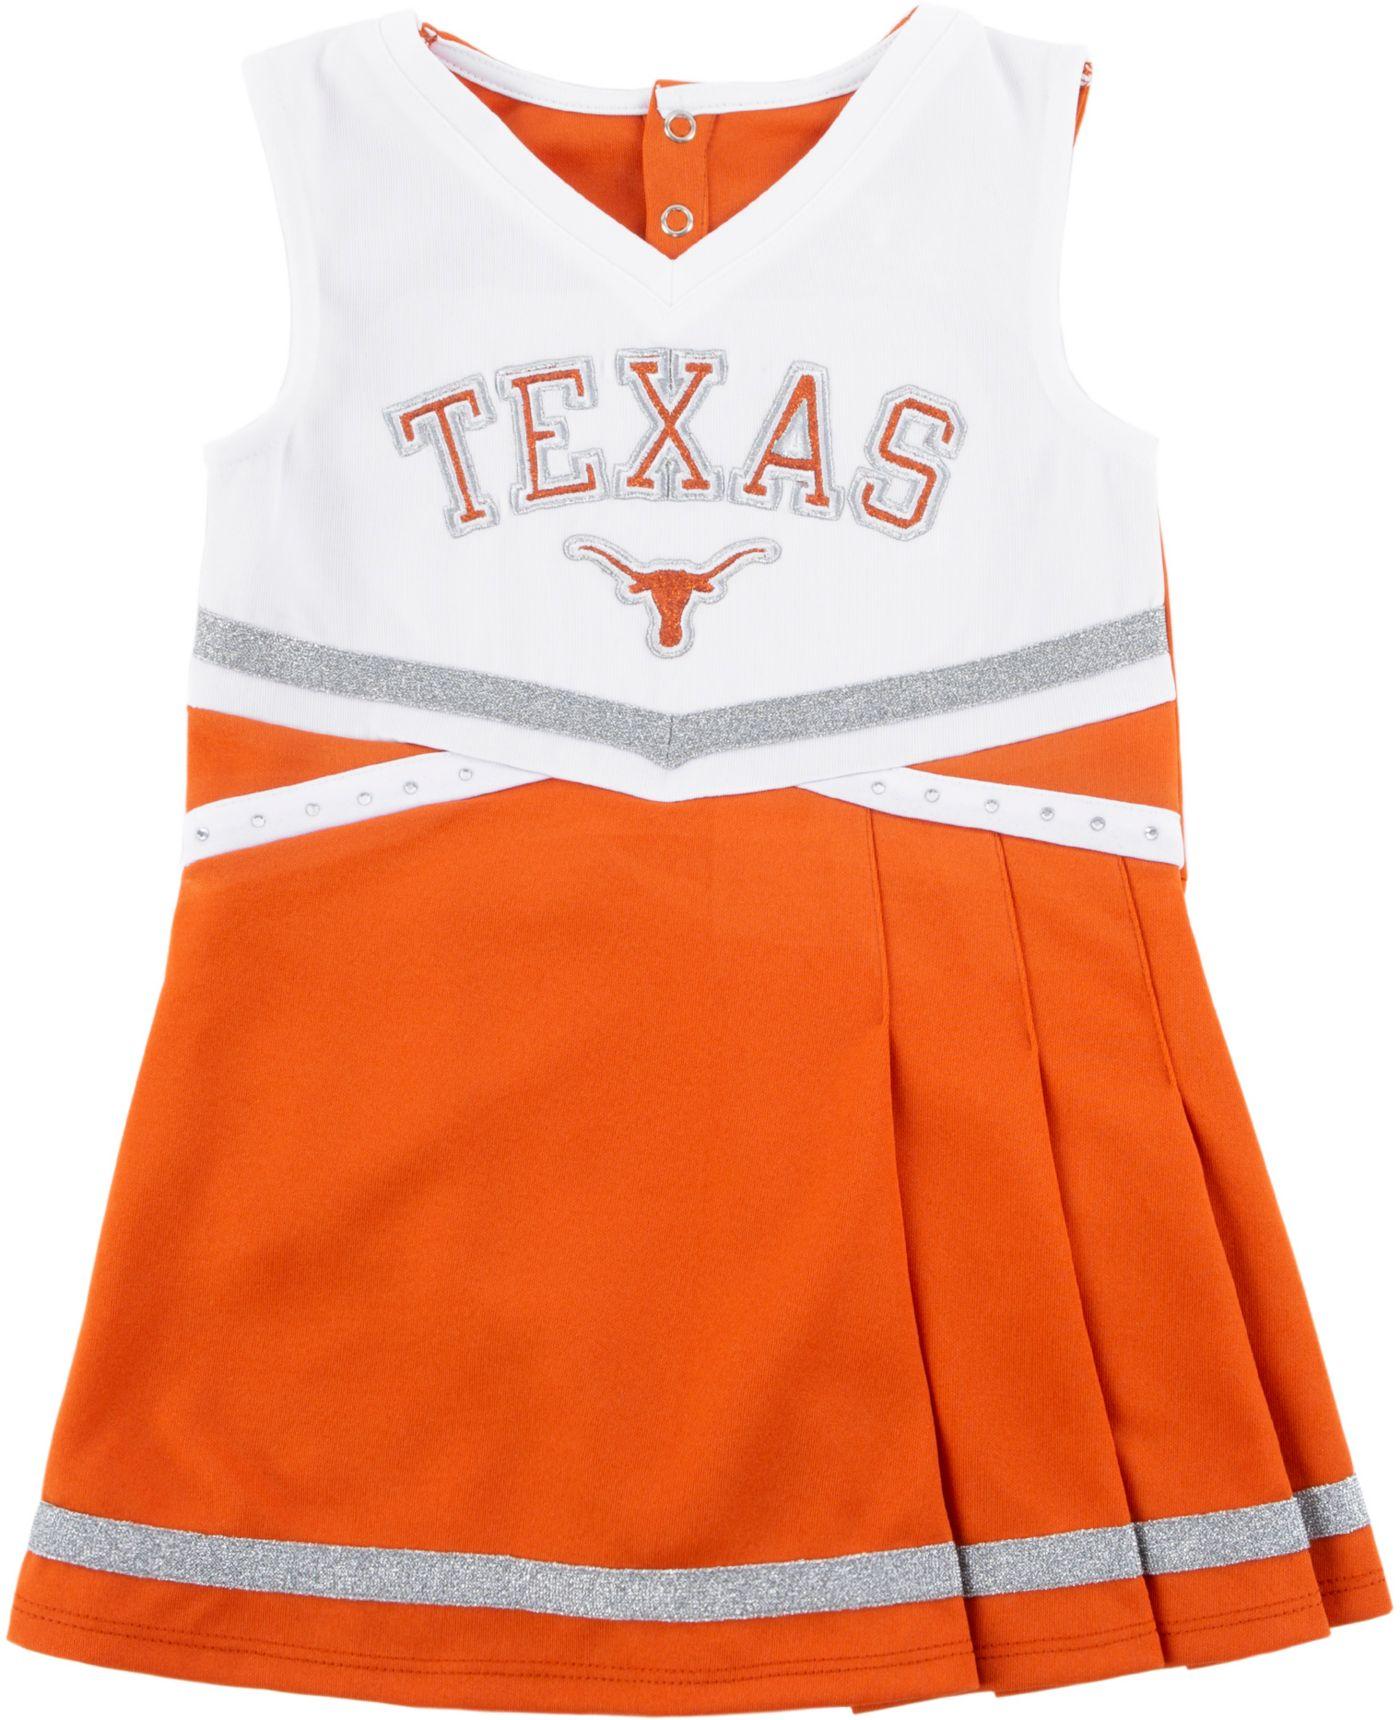 University of Texas Authentic Apparel Youth Girls' Texas Longhorns Burnt Orange Cheer Dress